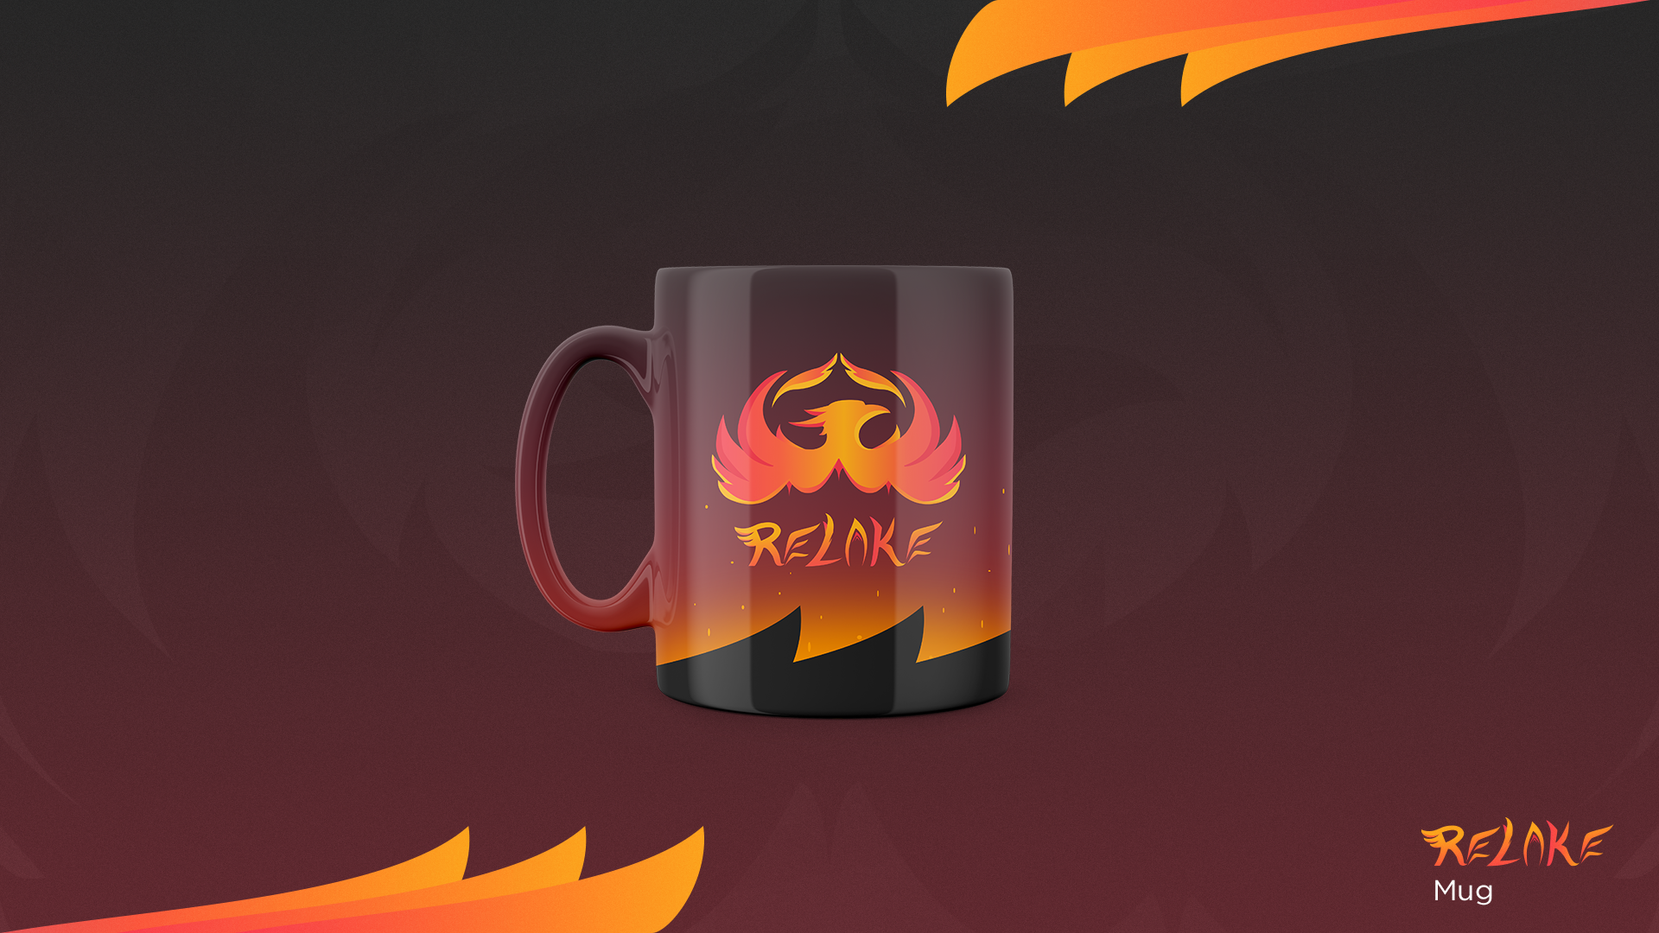 Mug pres.png